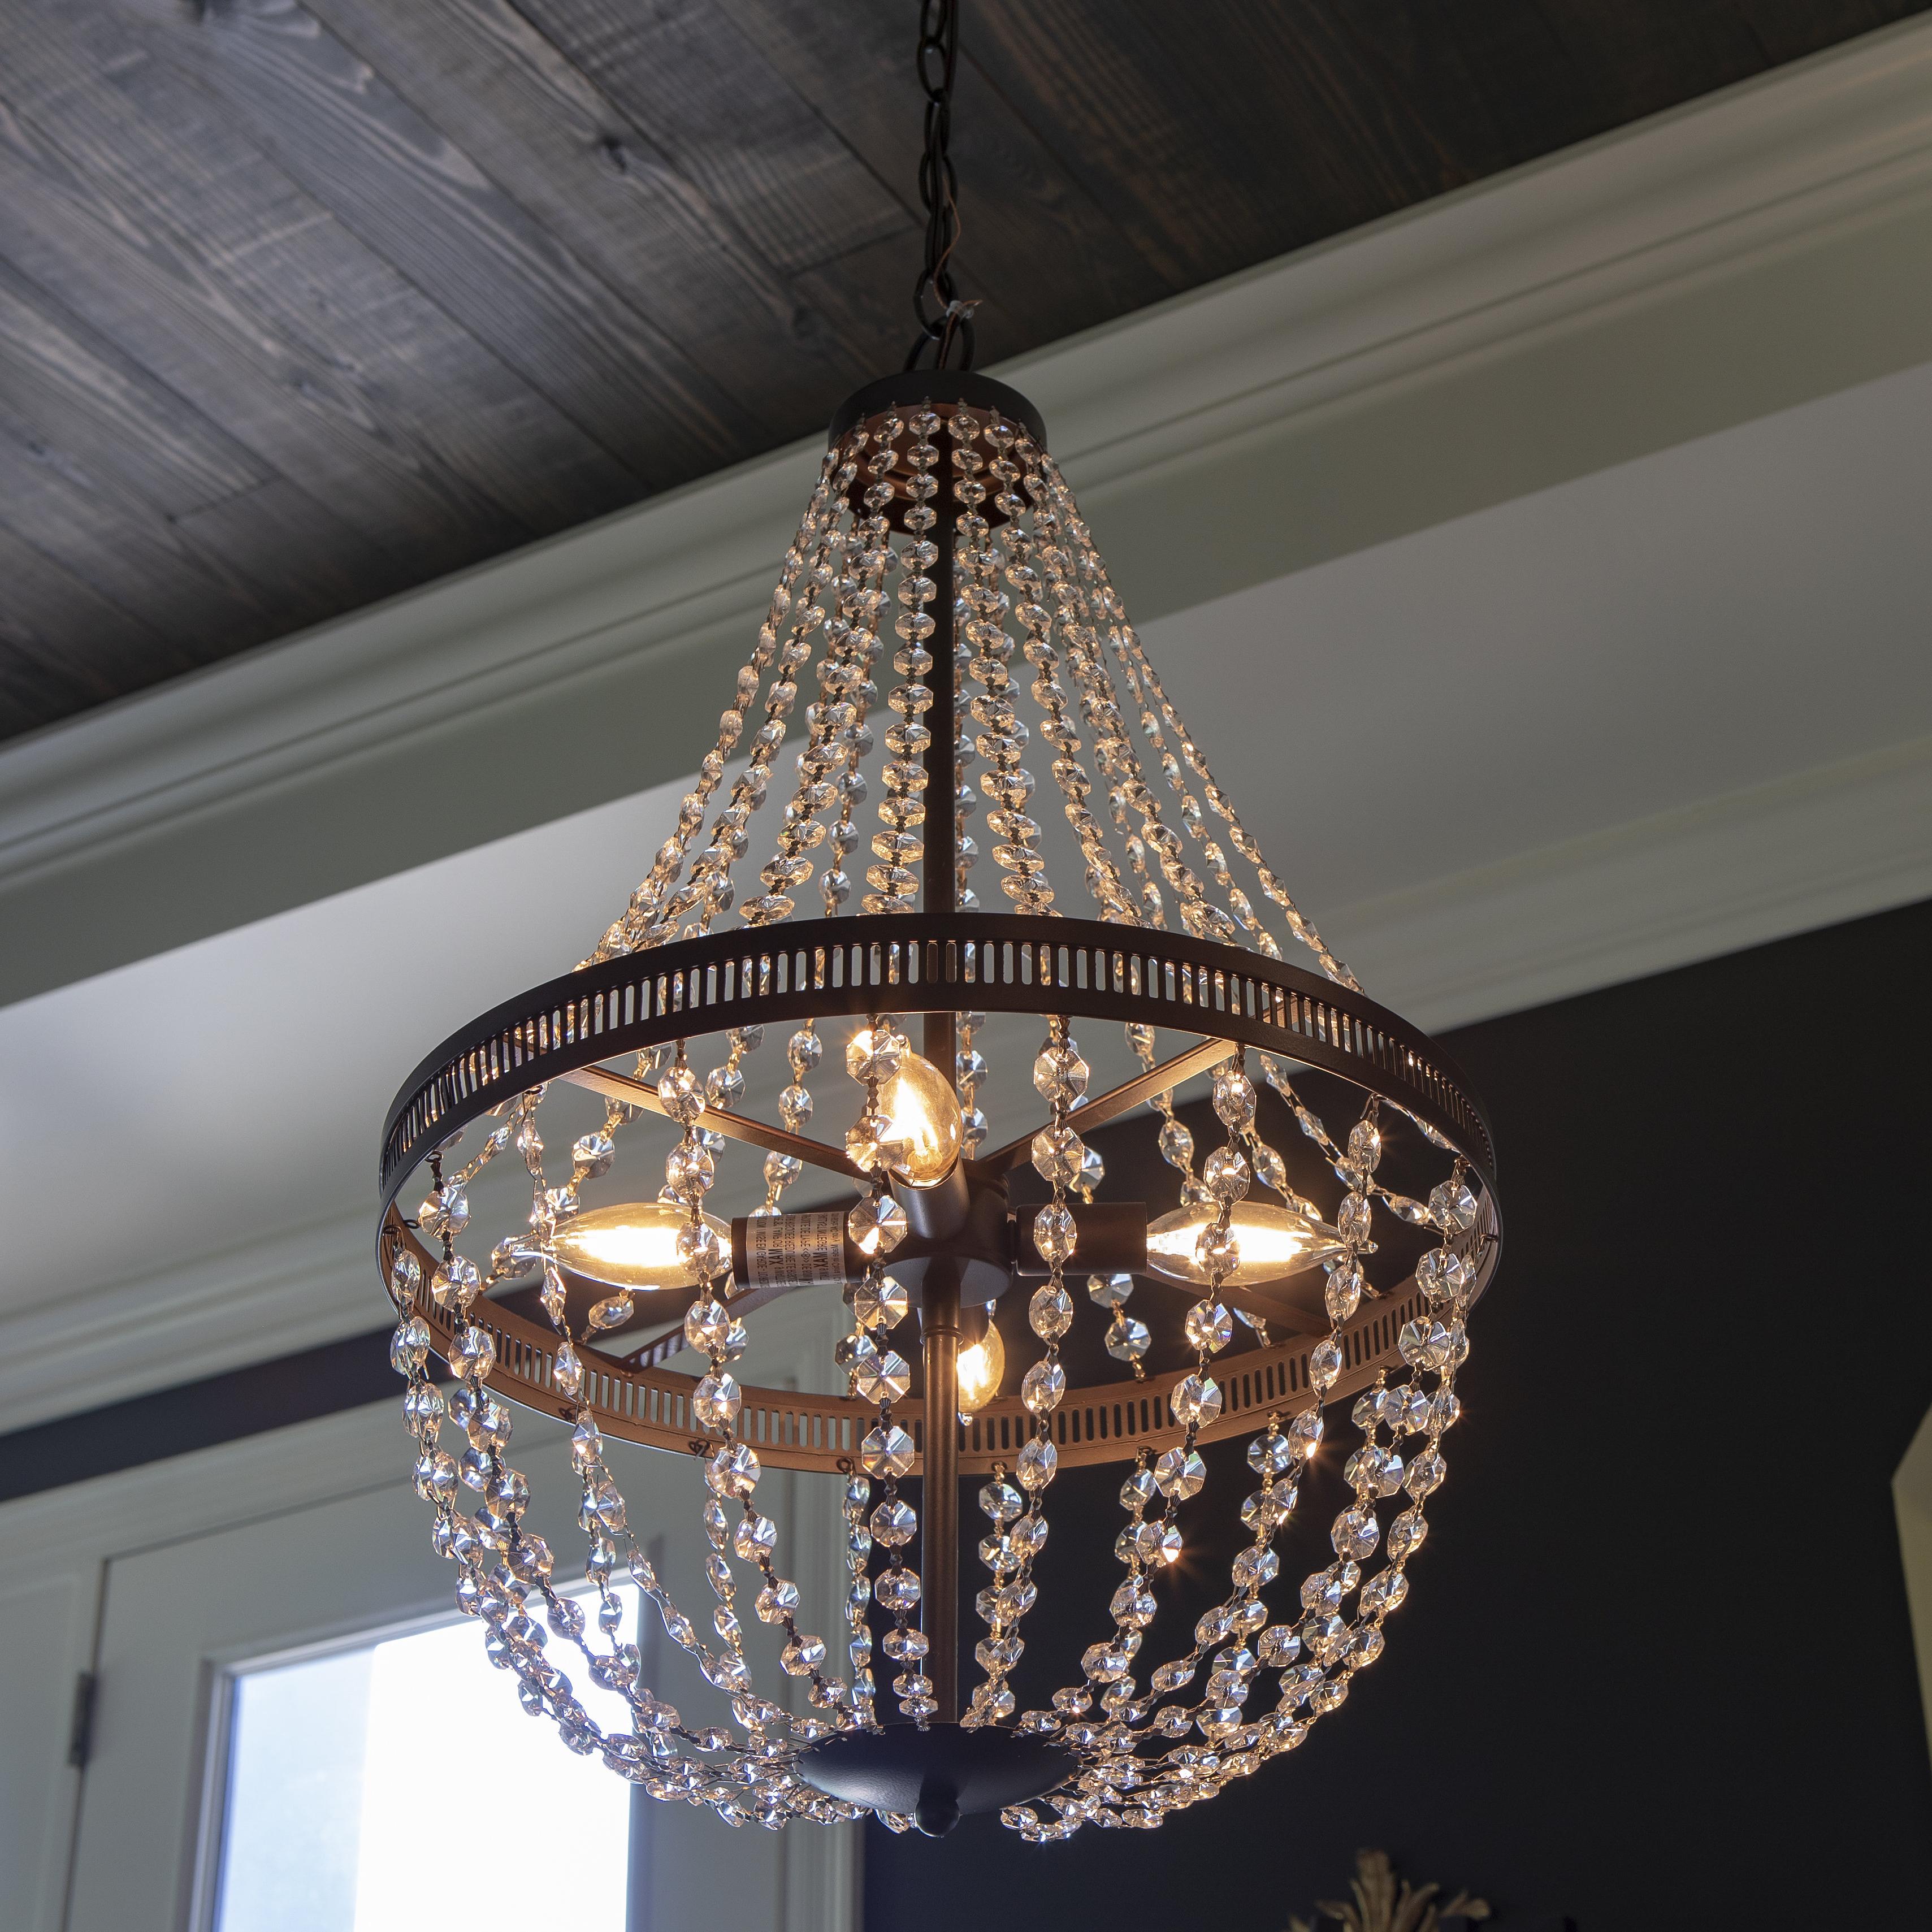 Popular Mckamey 4 Light Crystal Chandeliers Throughout House Of Hampton Weidman 4 Light Crystal Chandelier (View 18 of 20)